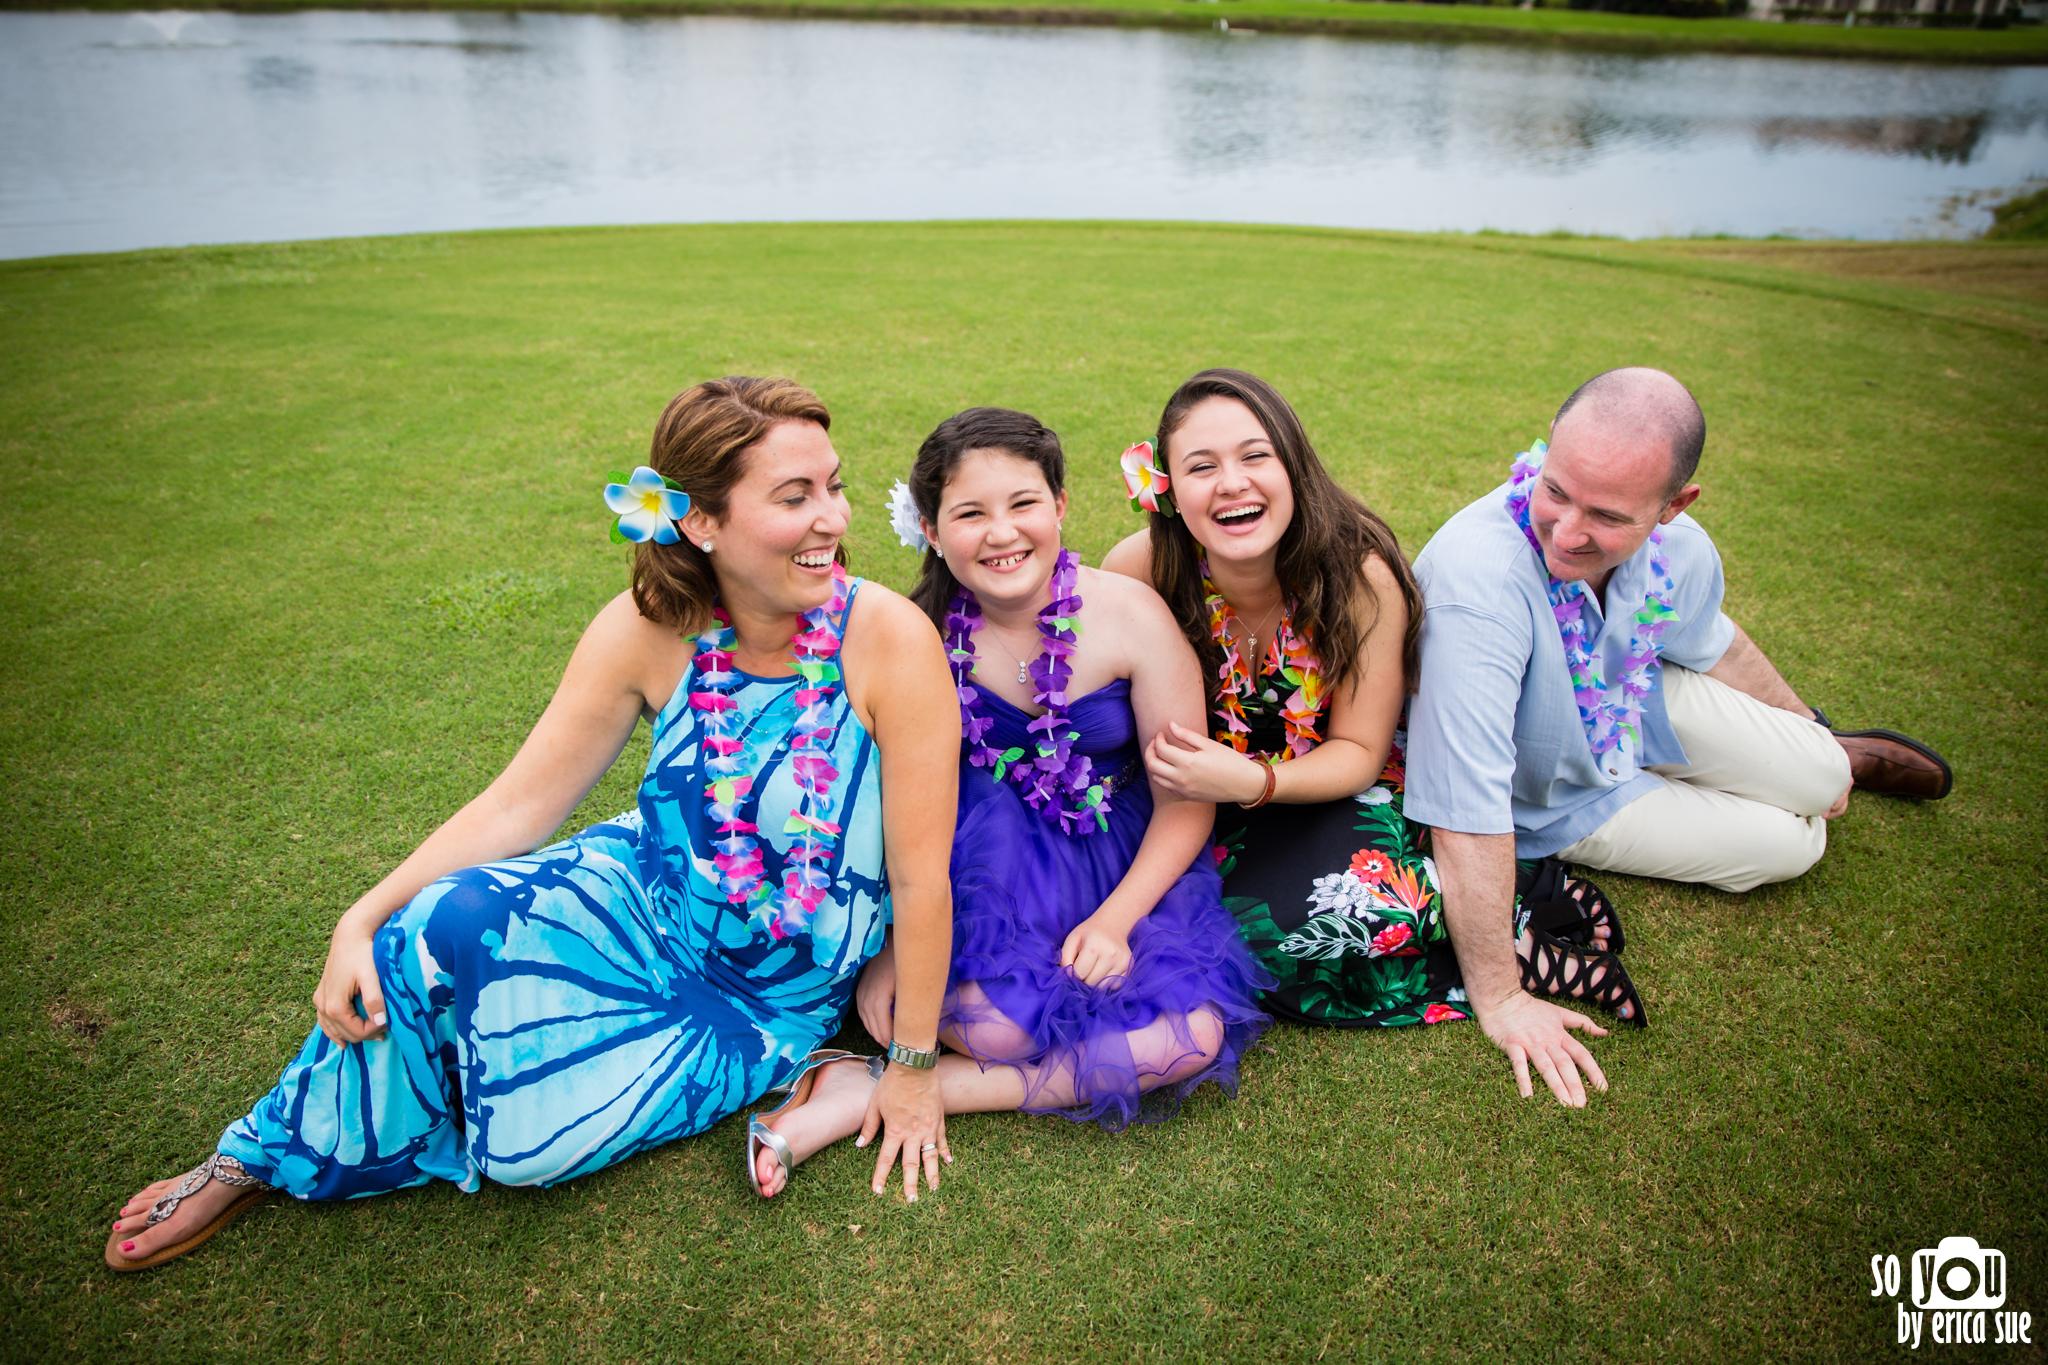 south-florida-broward-miami-mitzvah-photography-so-you-by-erica-sue-4892.jpg